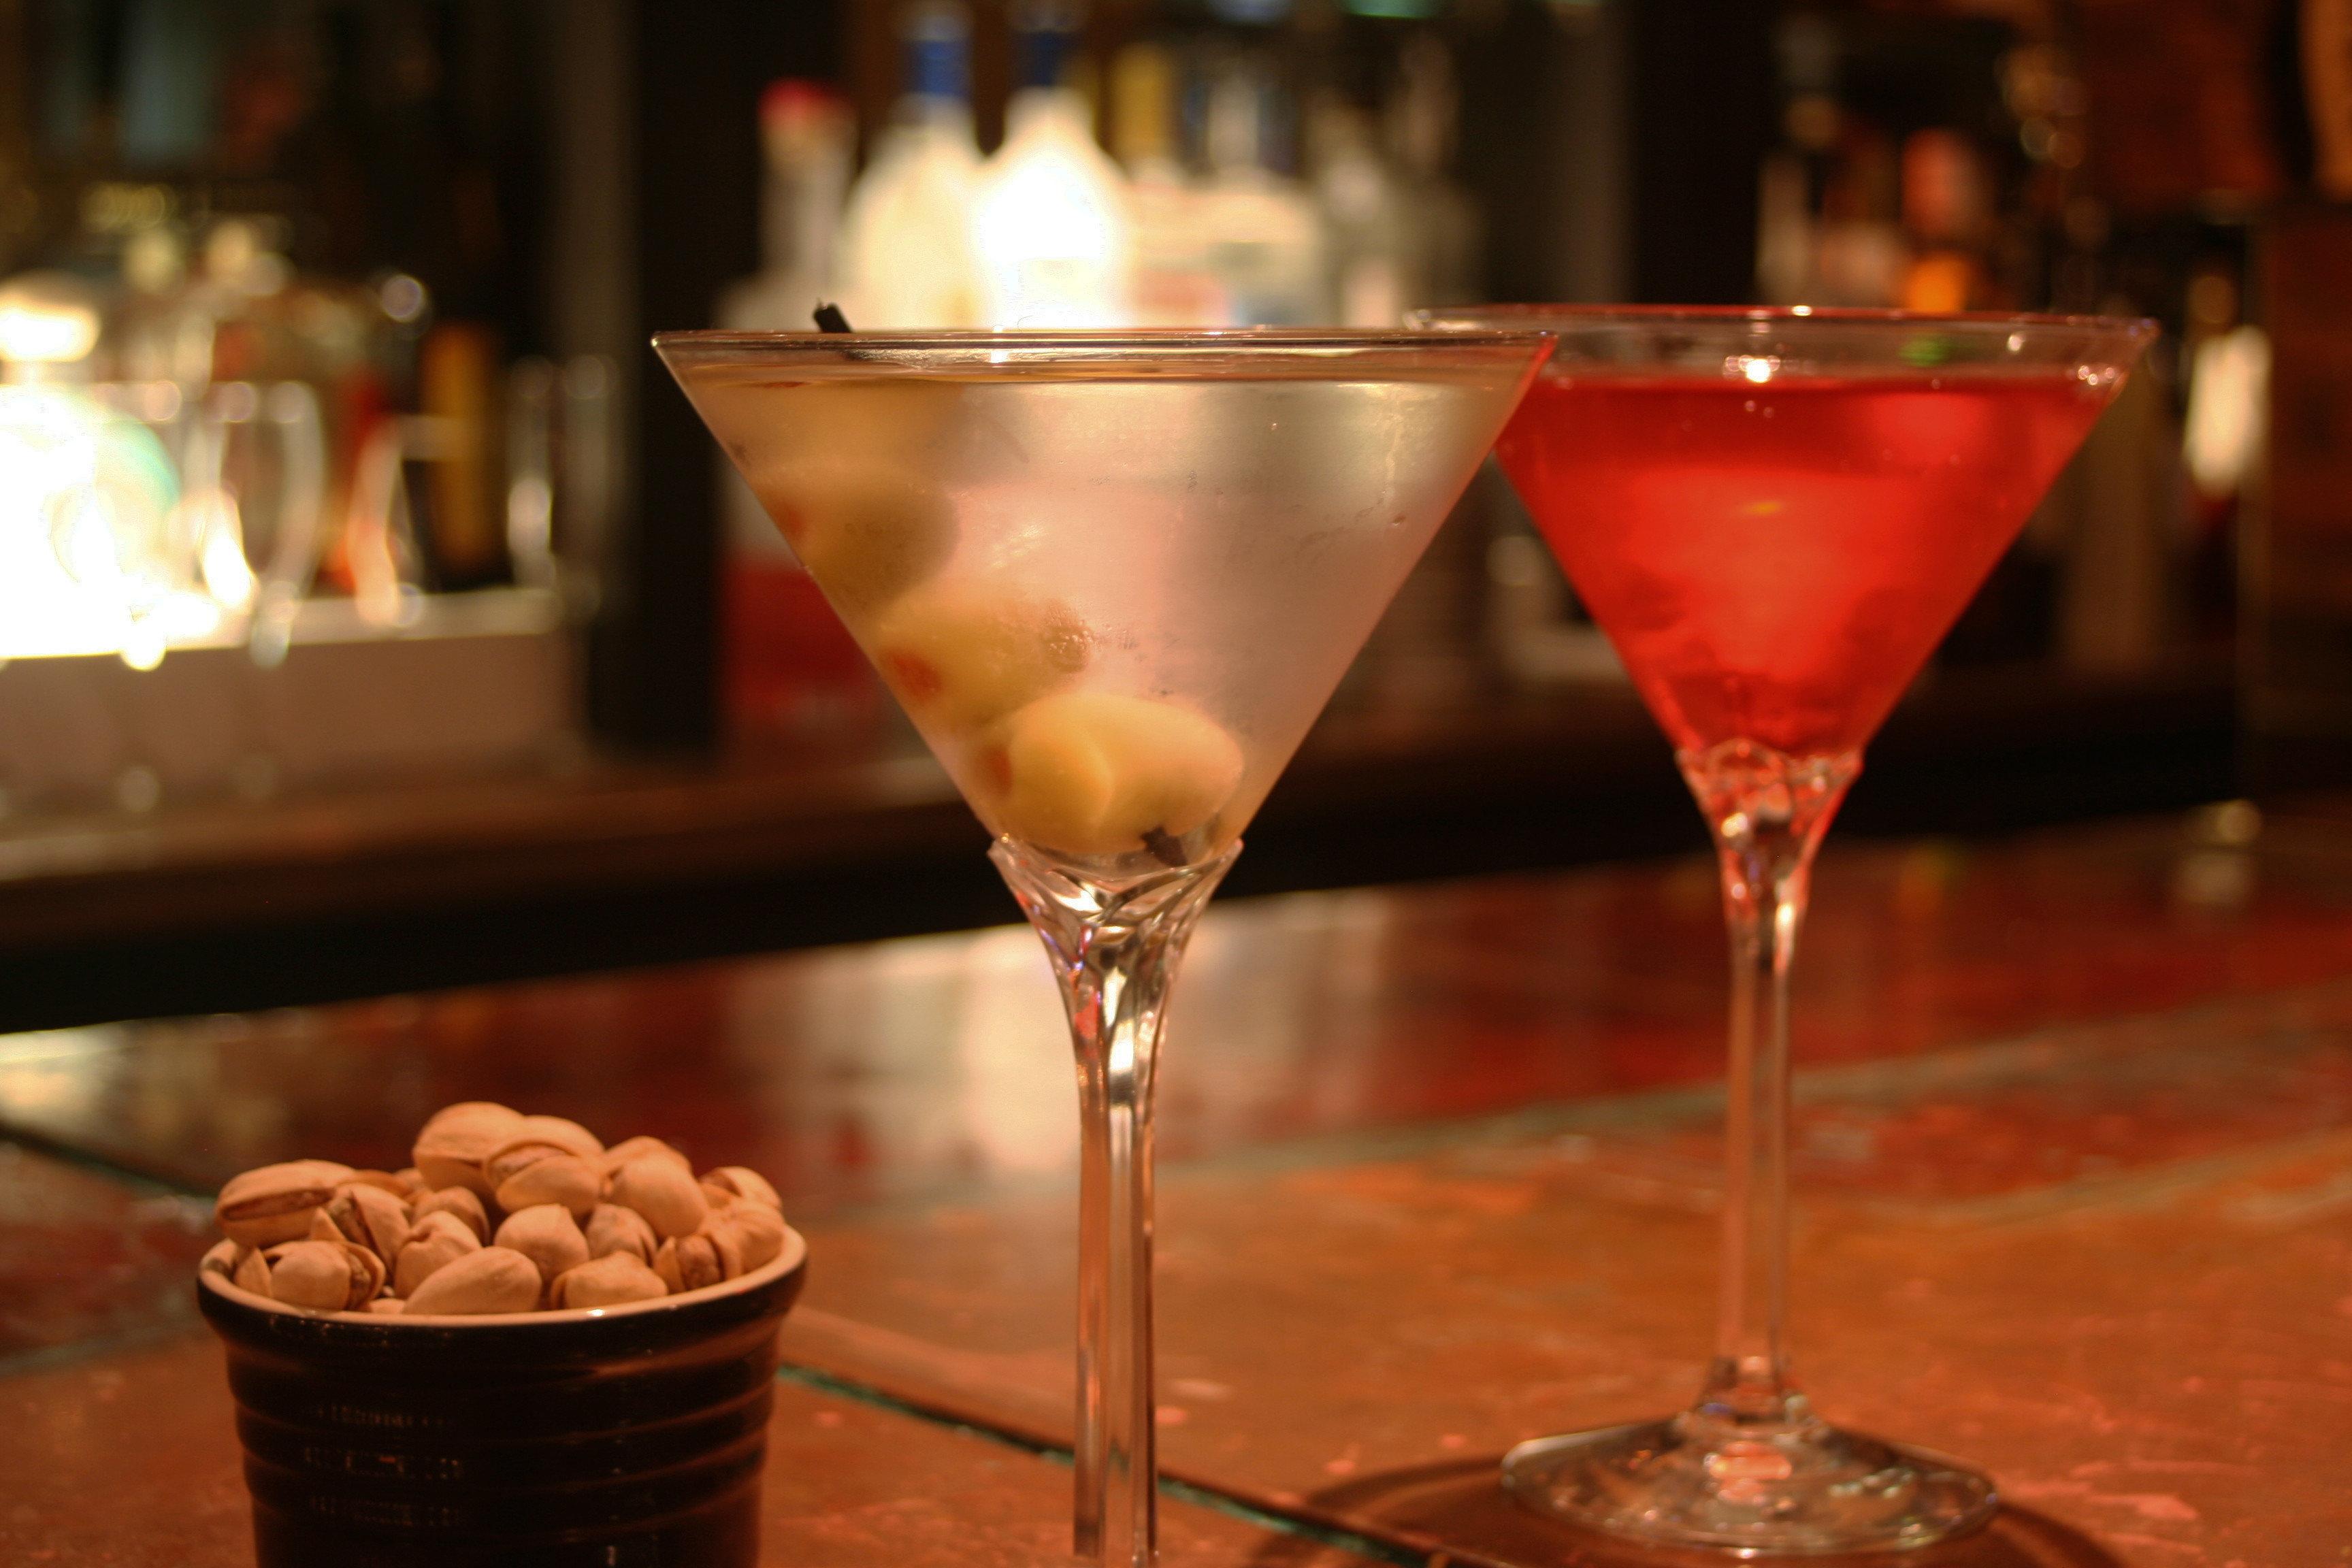 Drink wine glasses glass cocktail alcoholic beverage martini half alcohol cosmopolitan beverage